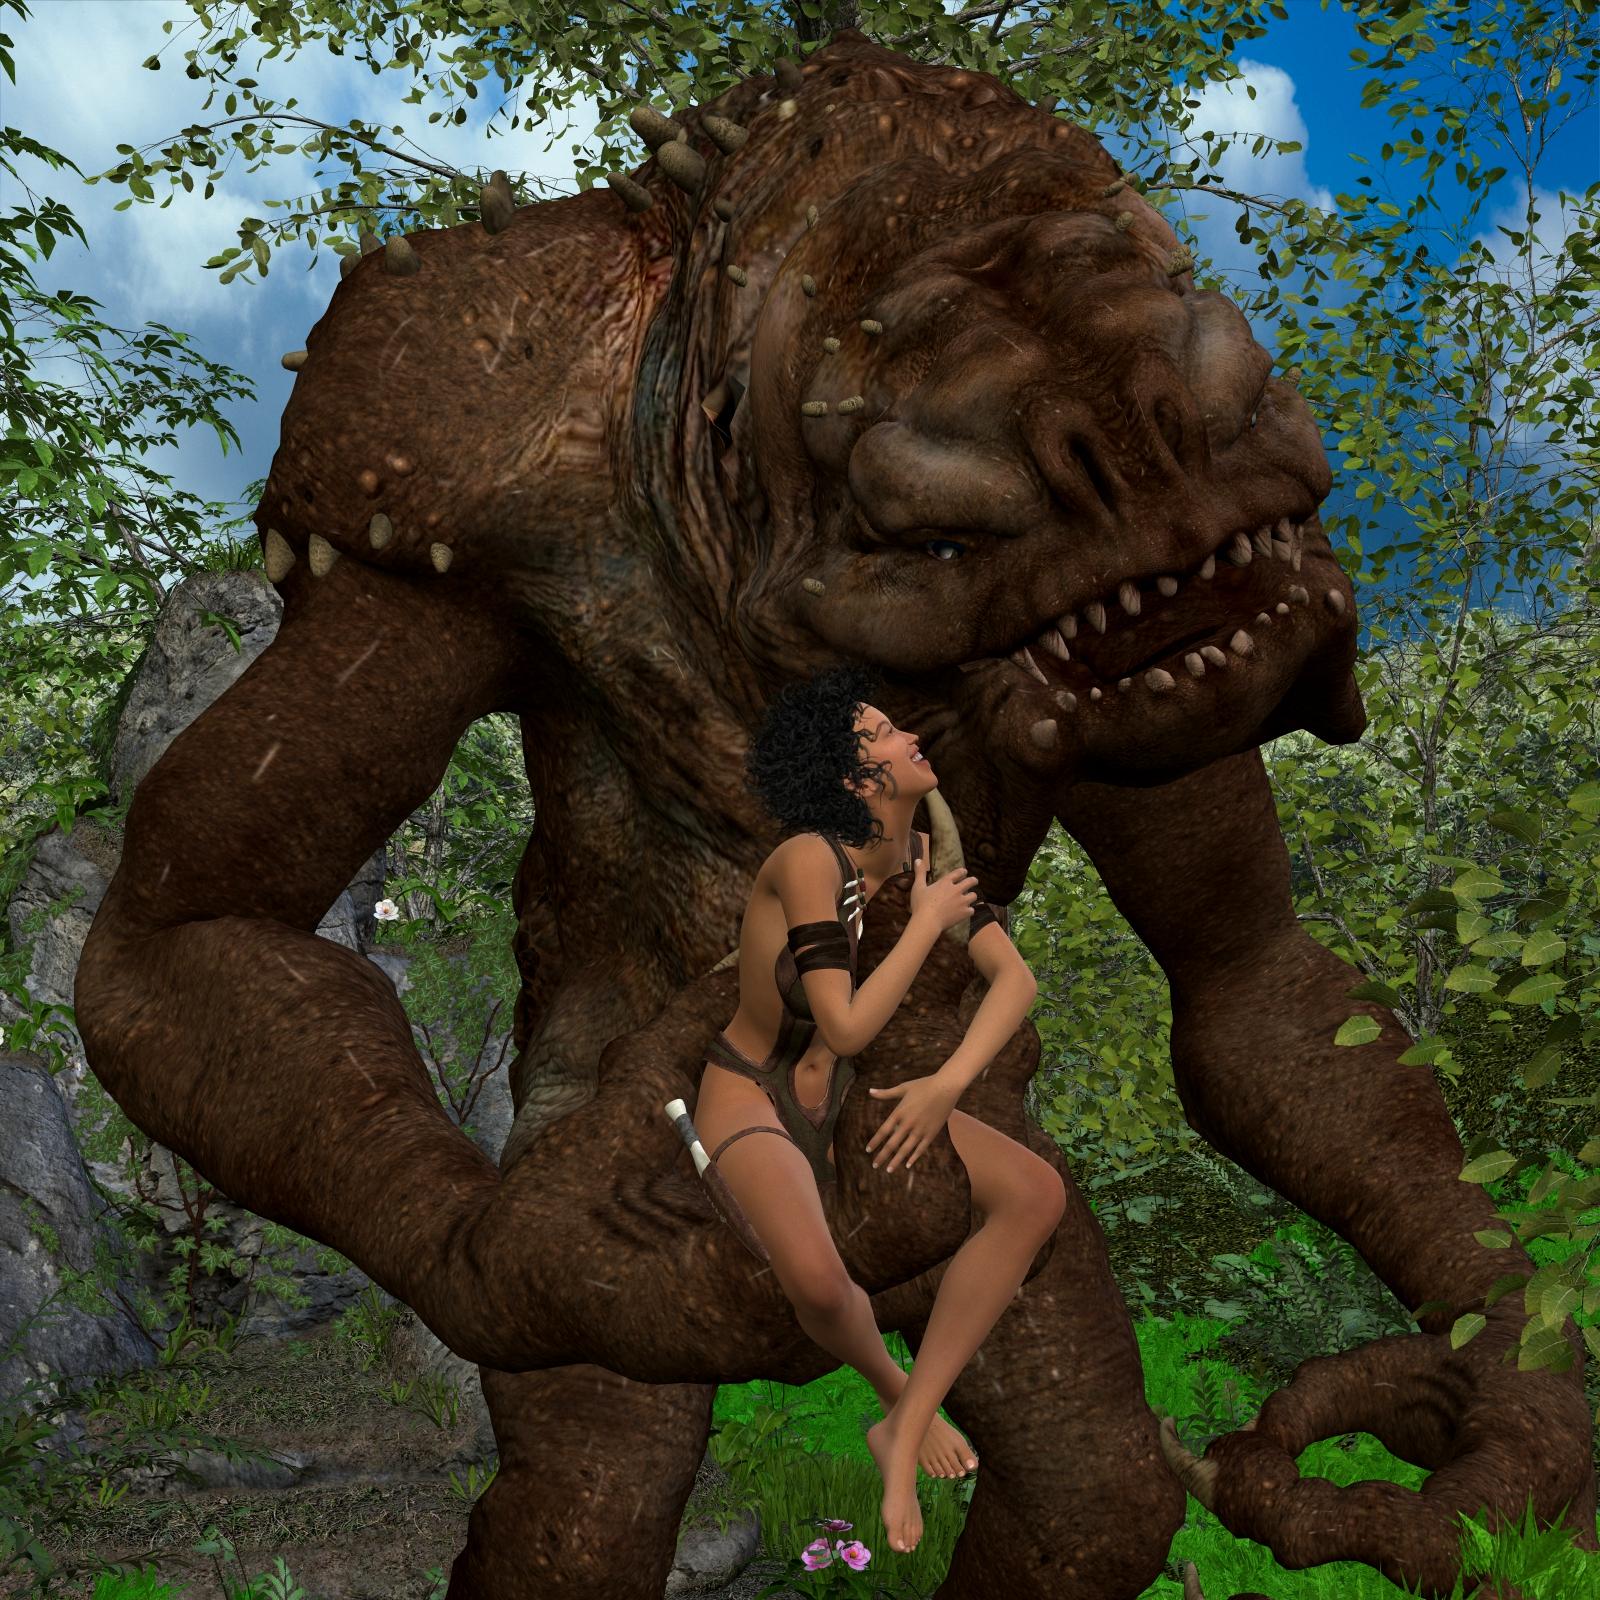 Junglegirl and Hubb 002 by thomvinson